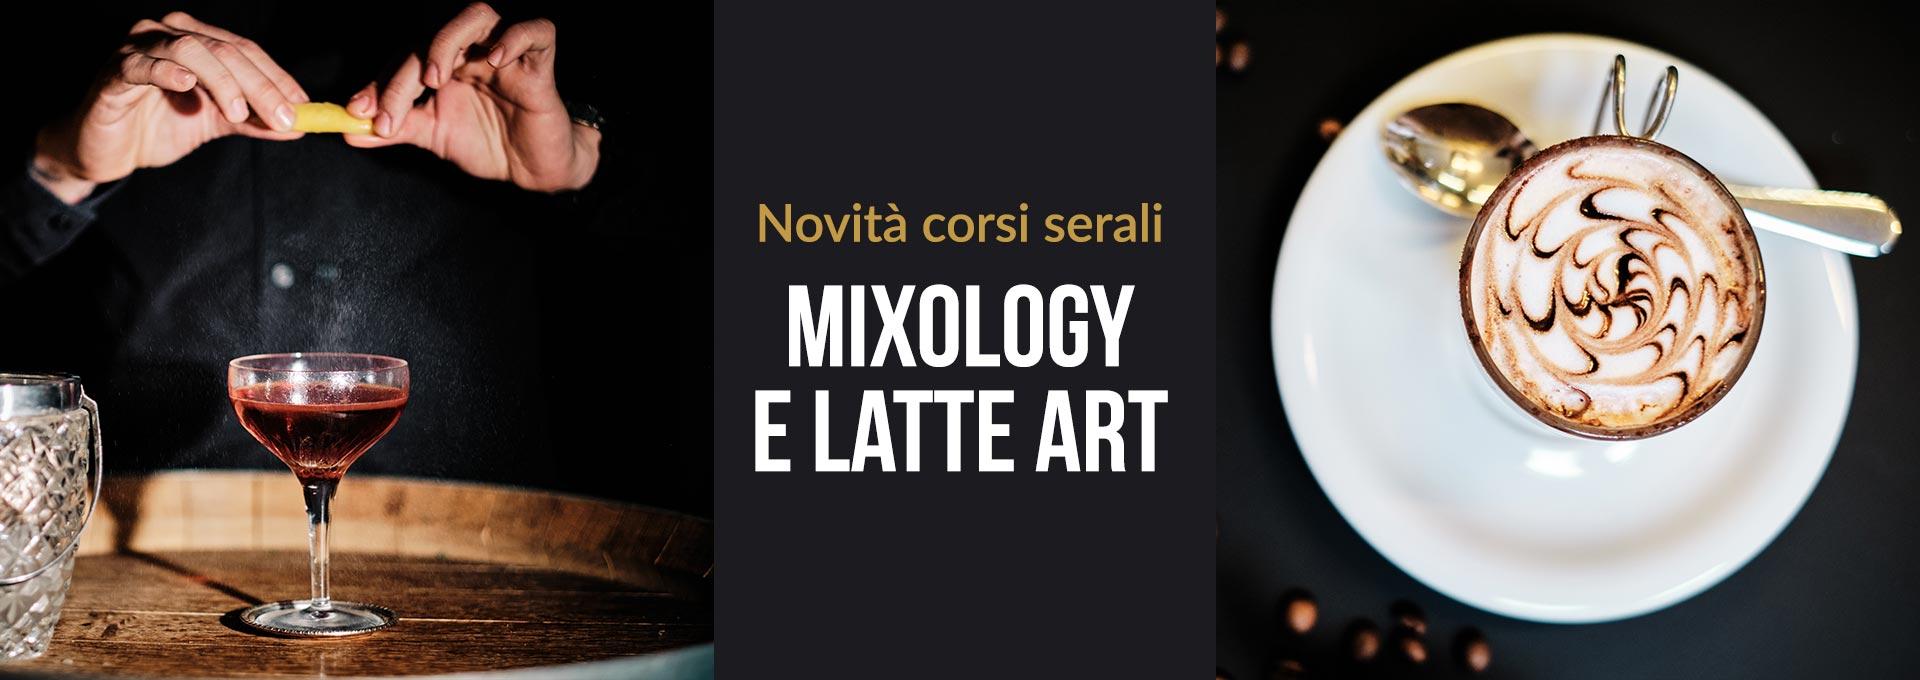 Novità corsi serali - Latte Art e Mixology